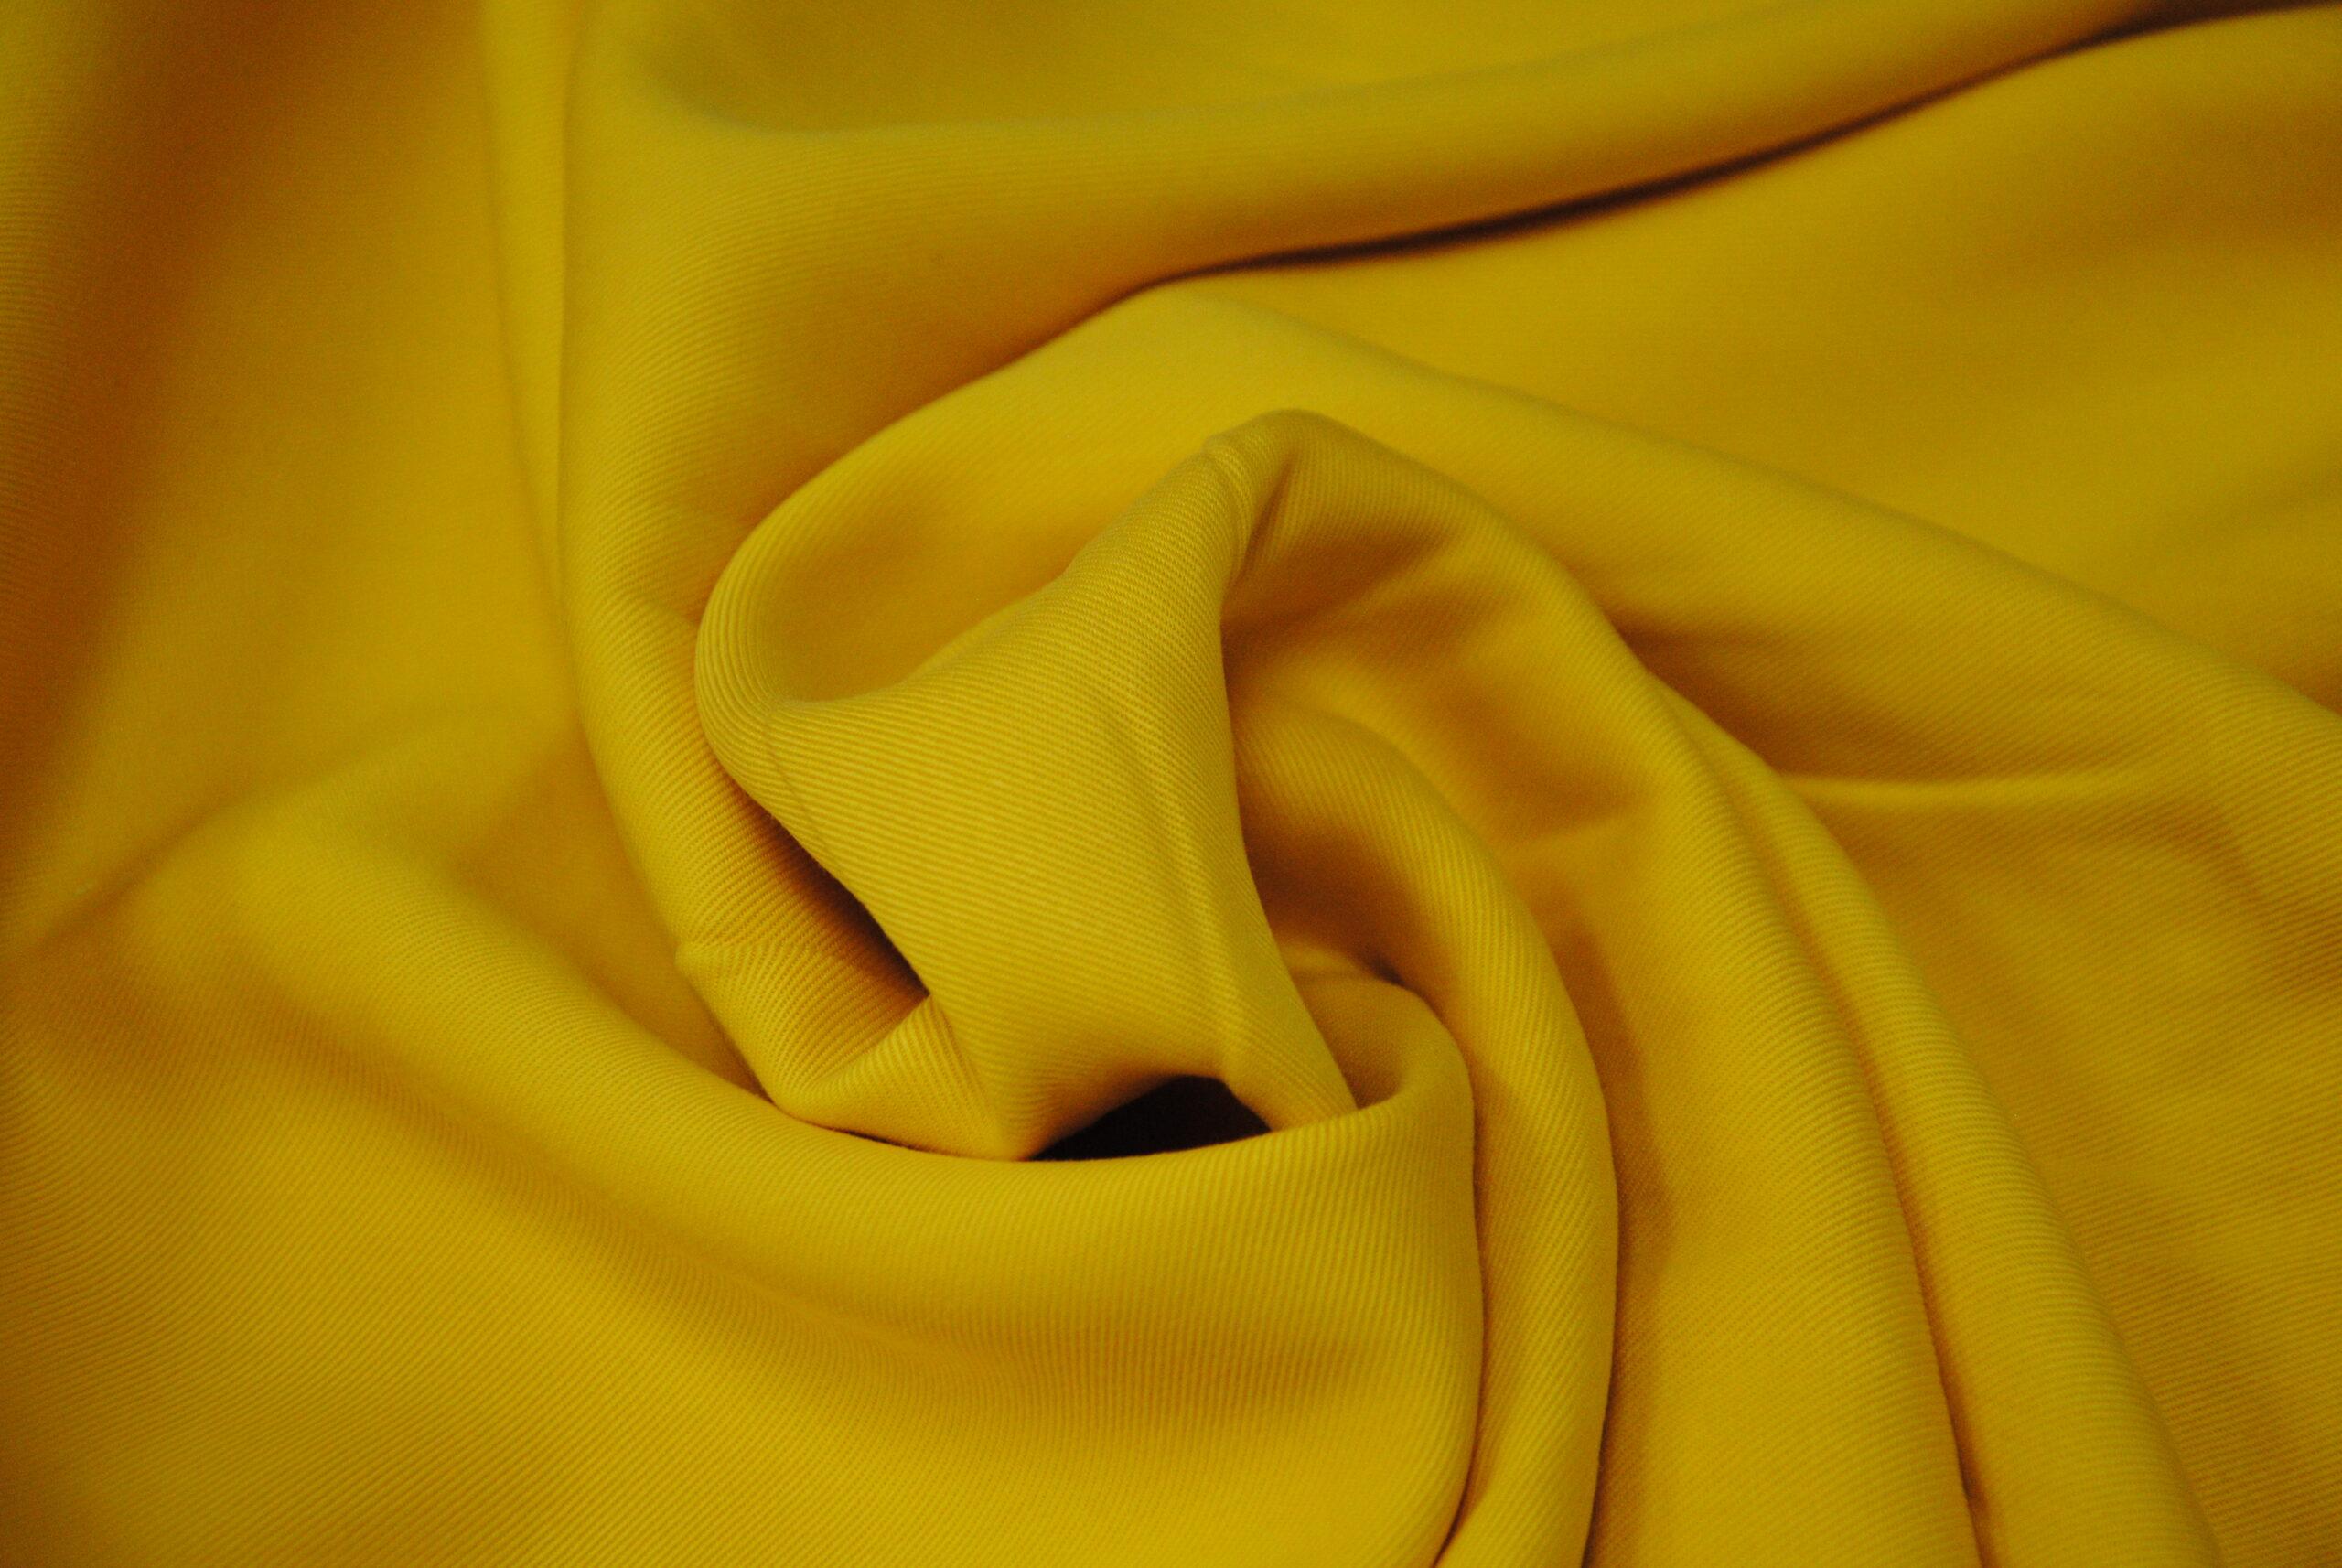 DSC 0028 scaled EUCALIPTO   giallo